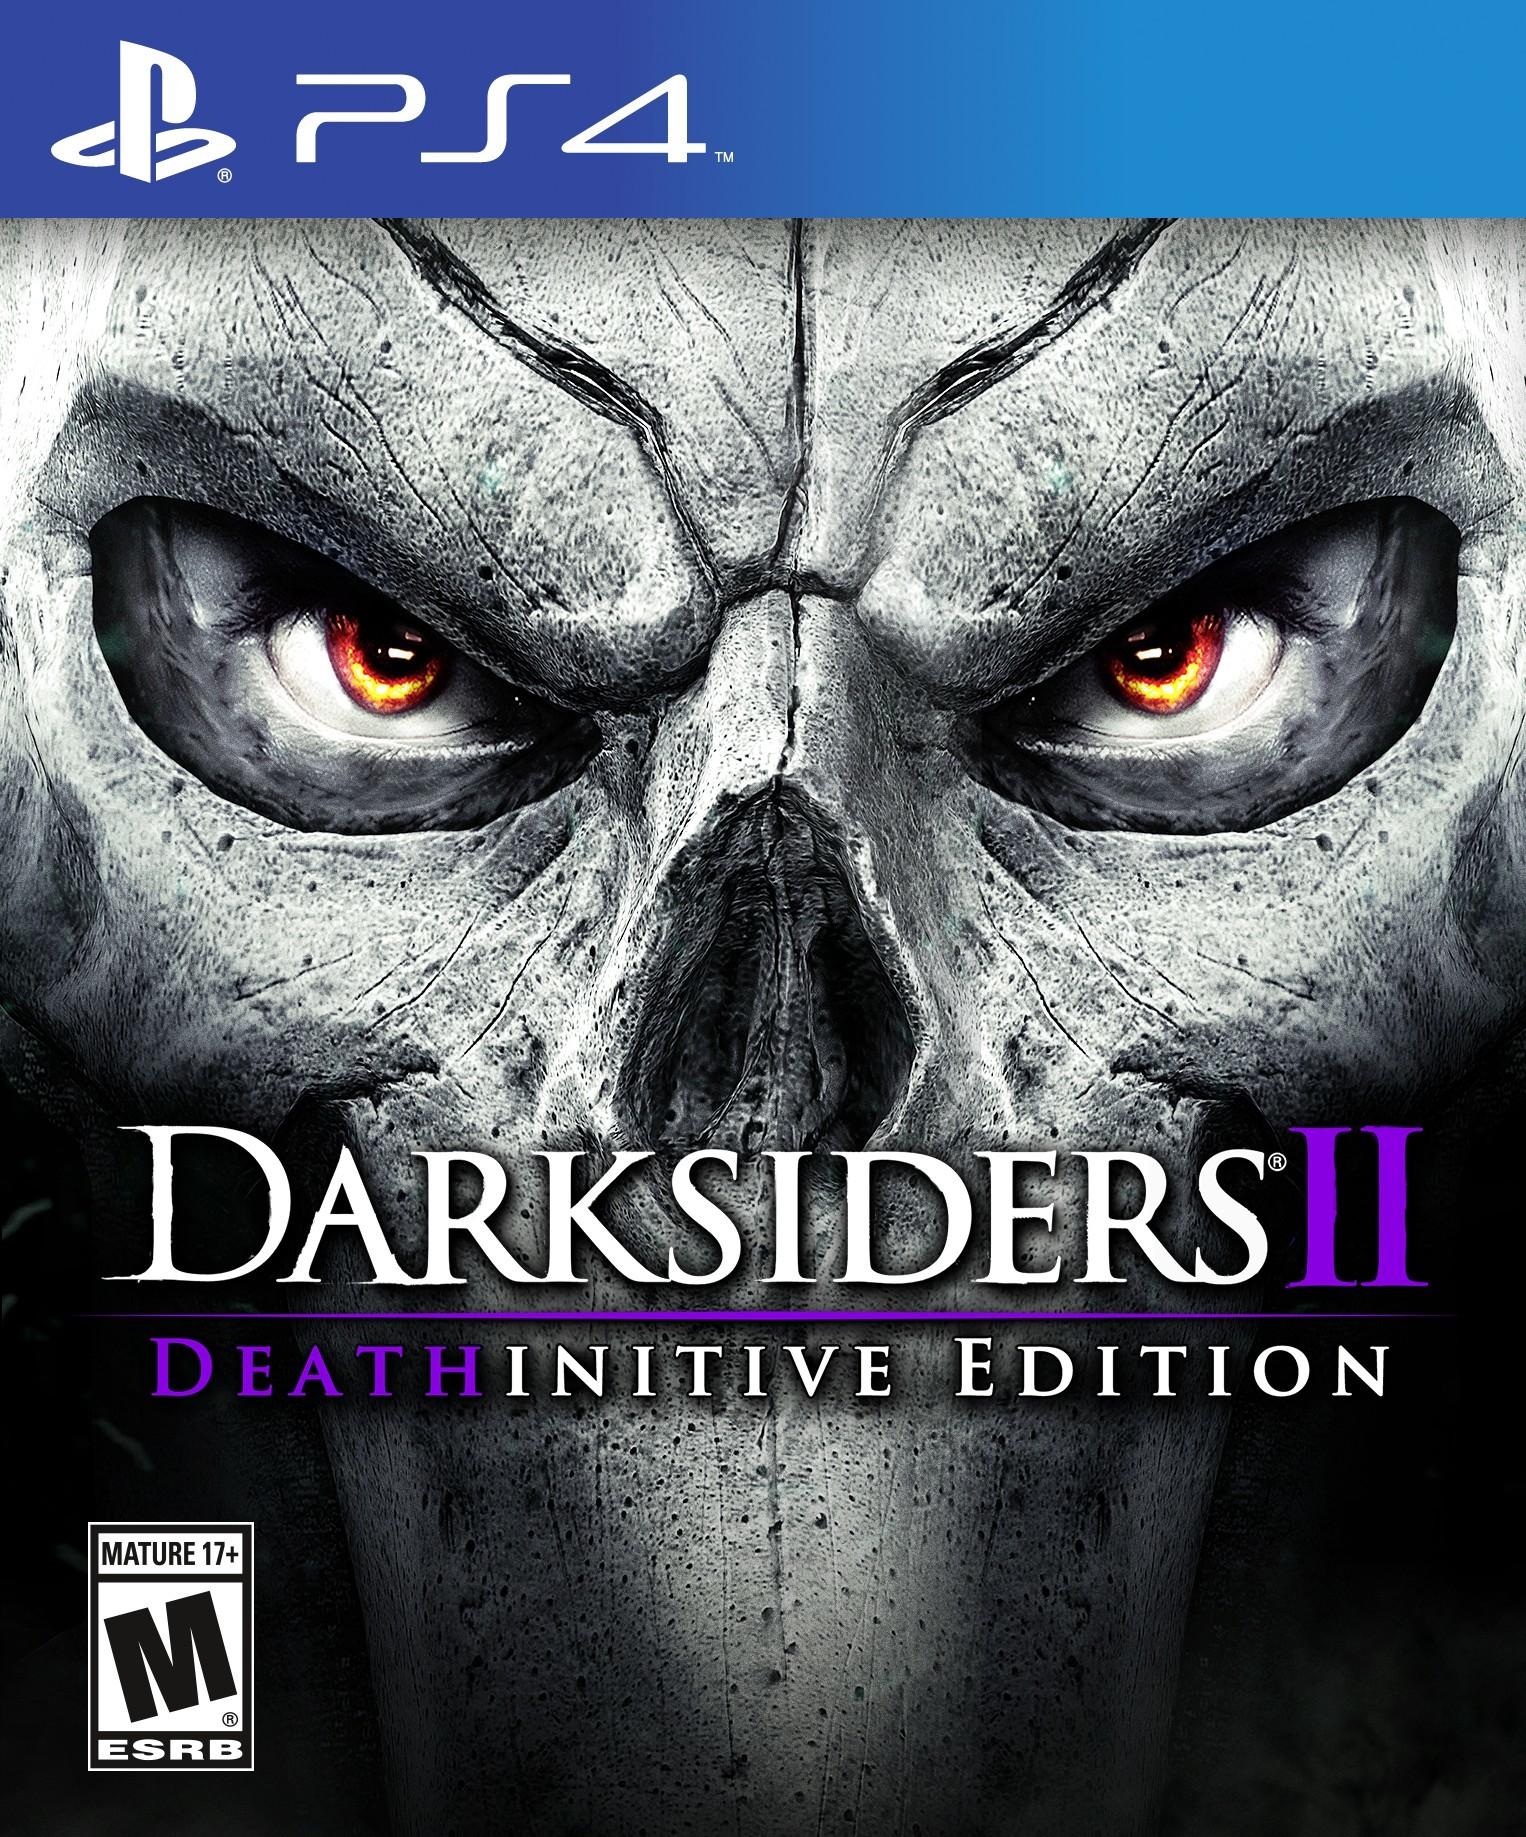 Foto de Darksiders II Deathfinitive Edition (4/4)